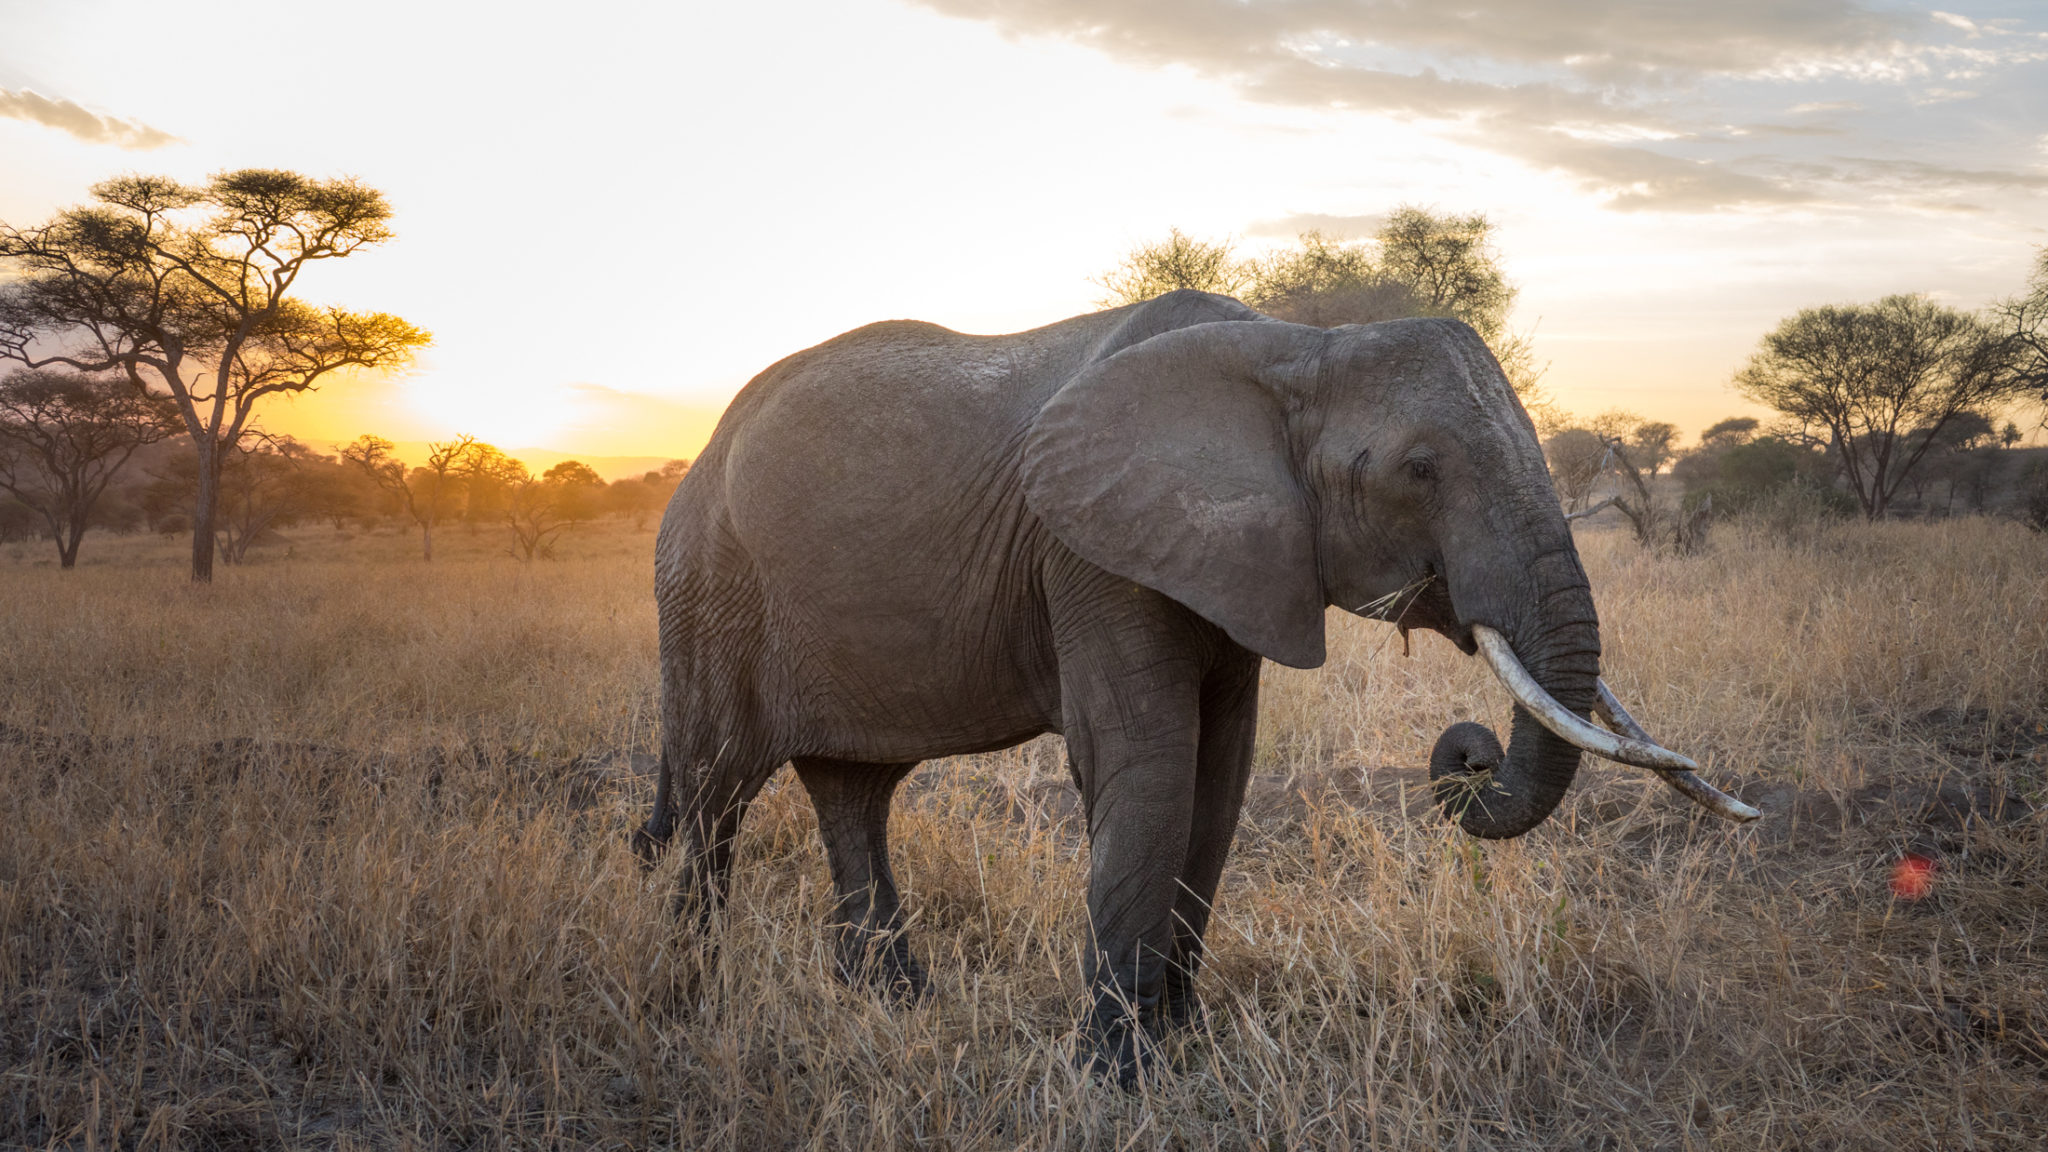 Elefant im Sonnenuntergang im Tarangire Nationalpark, Tansania